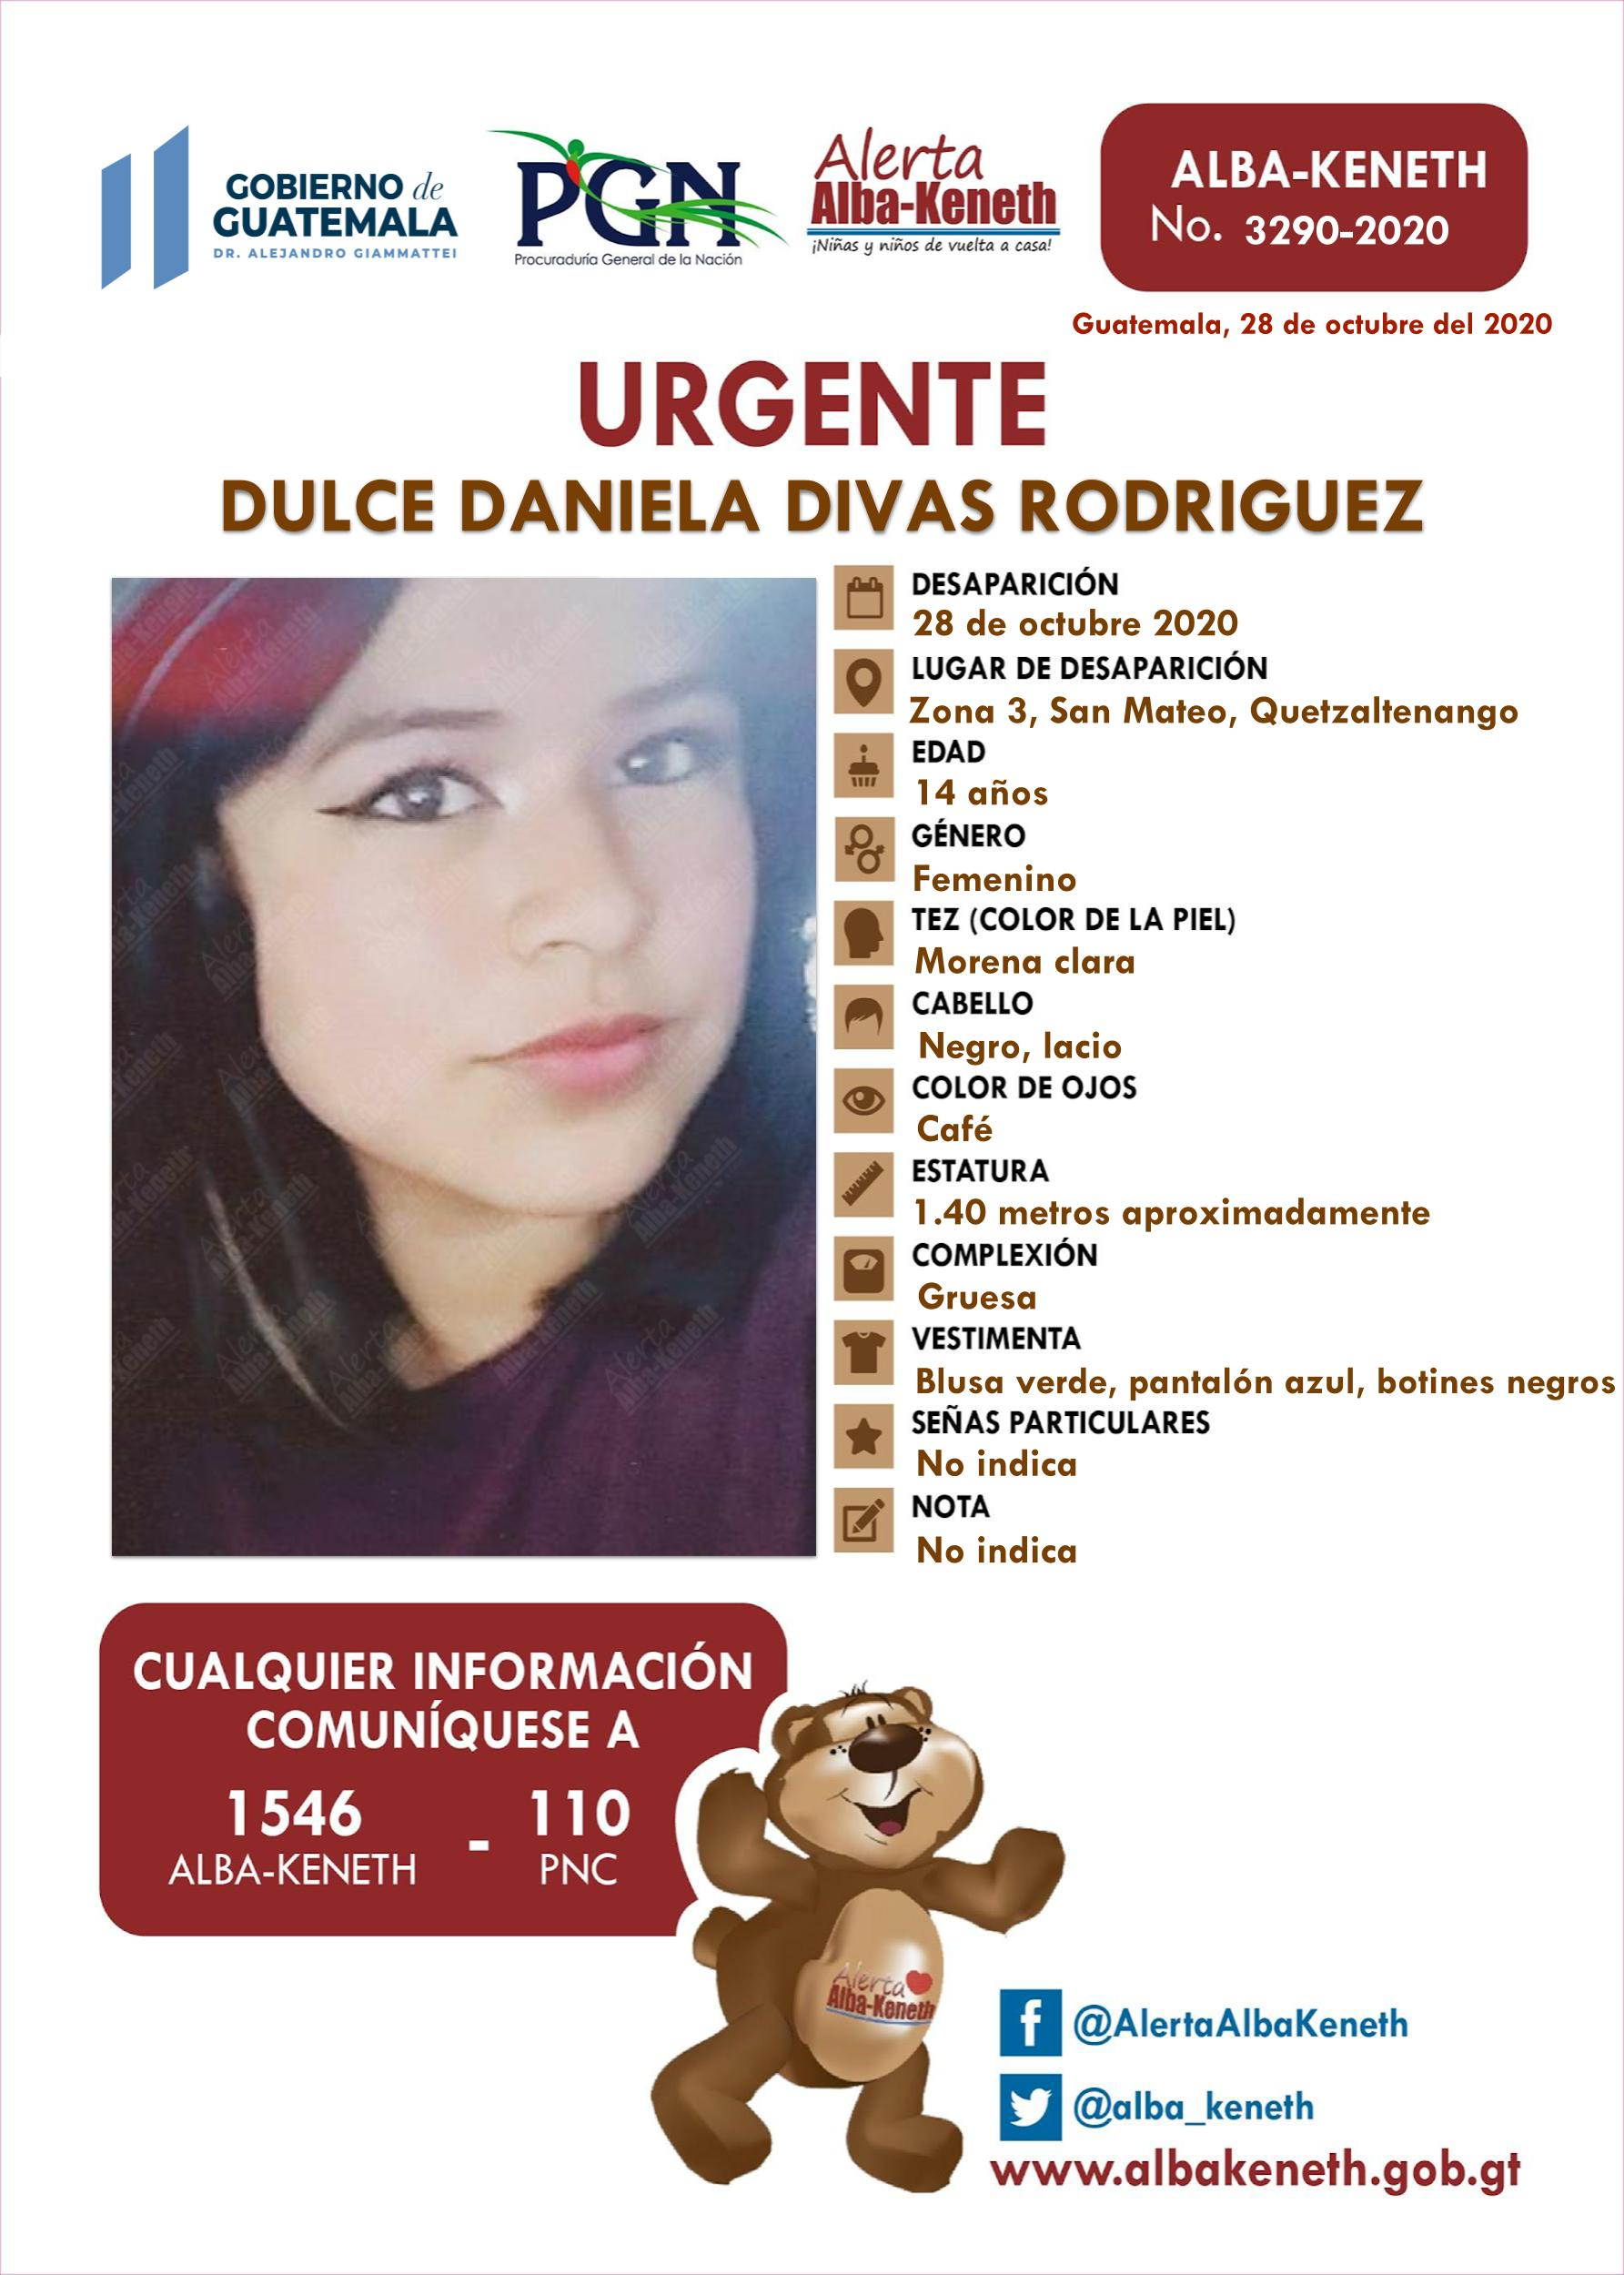 Dulce Daniela Divas Rodriguez